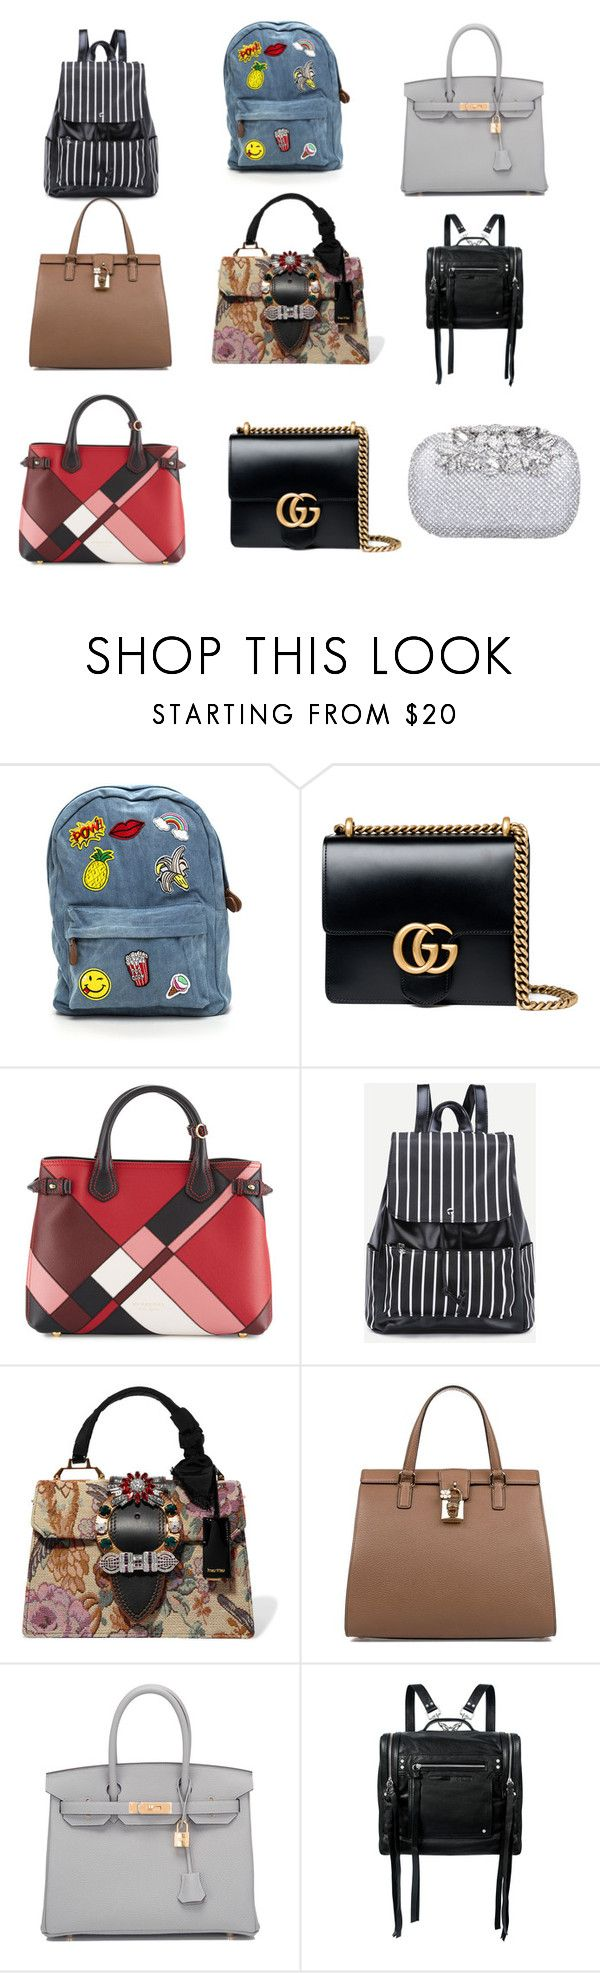 """BAGS"" by nurzarmina on Polyvore featuring Gucci, Burberry, Miu Miu, Dolce&Gabbana, Hermès and McQ by Alexander McQueen"